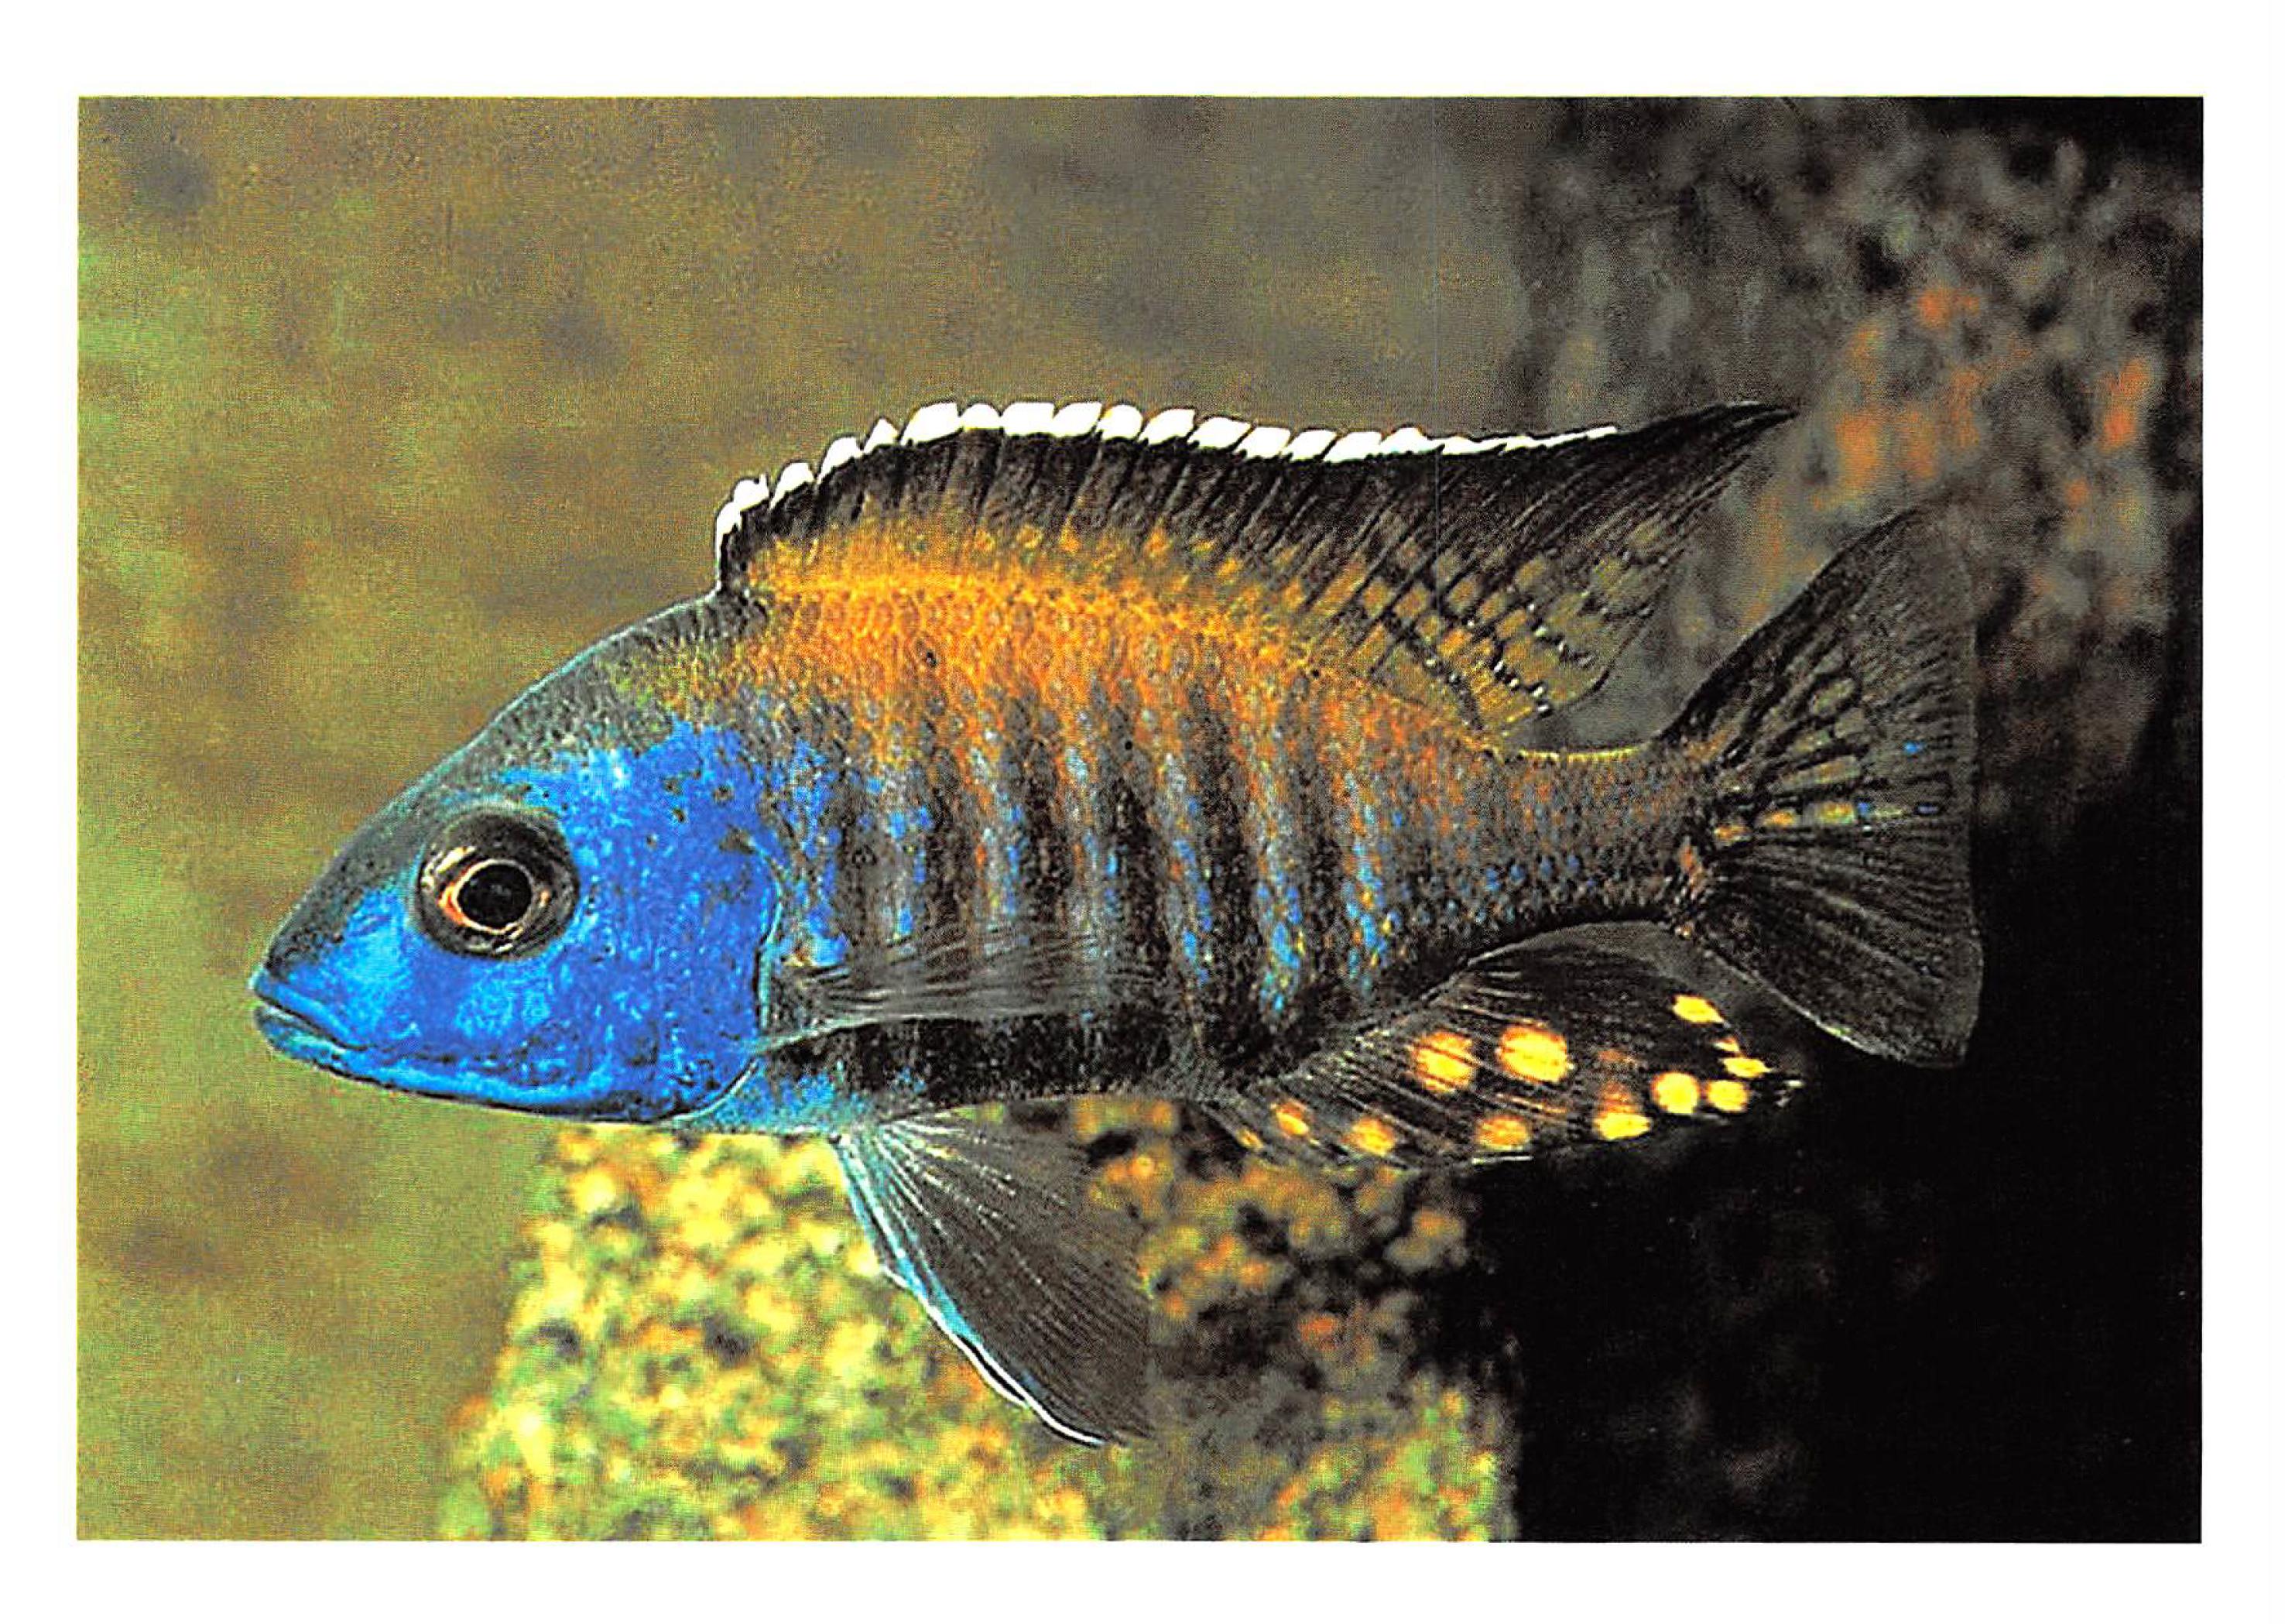 Peacock Cichlid (Aulonocara)